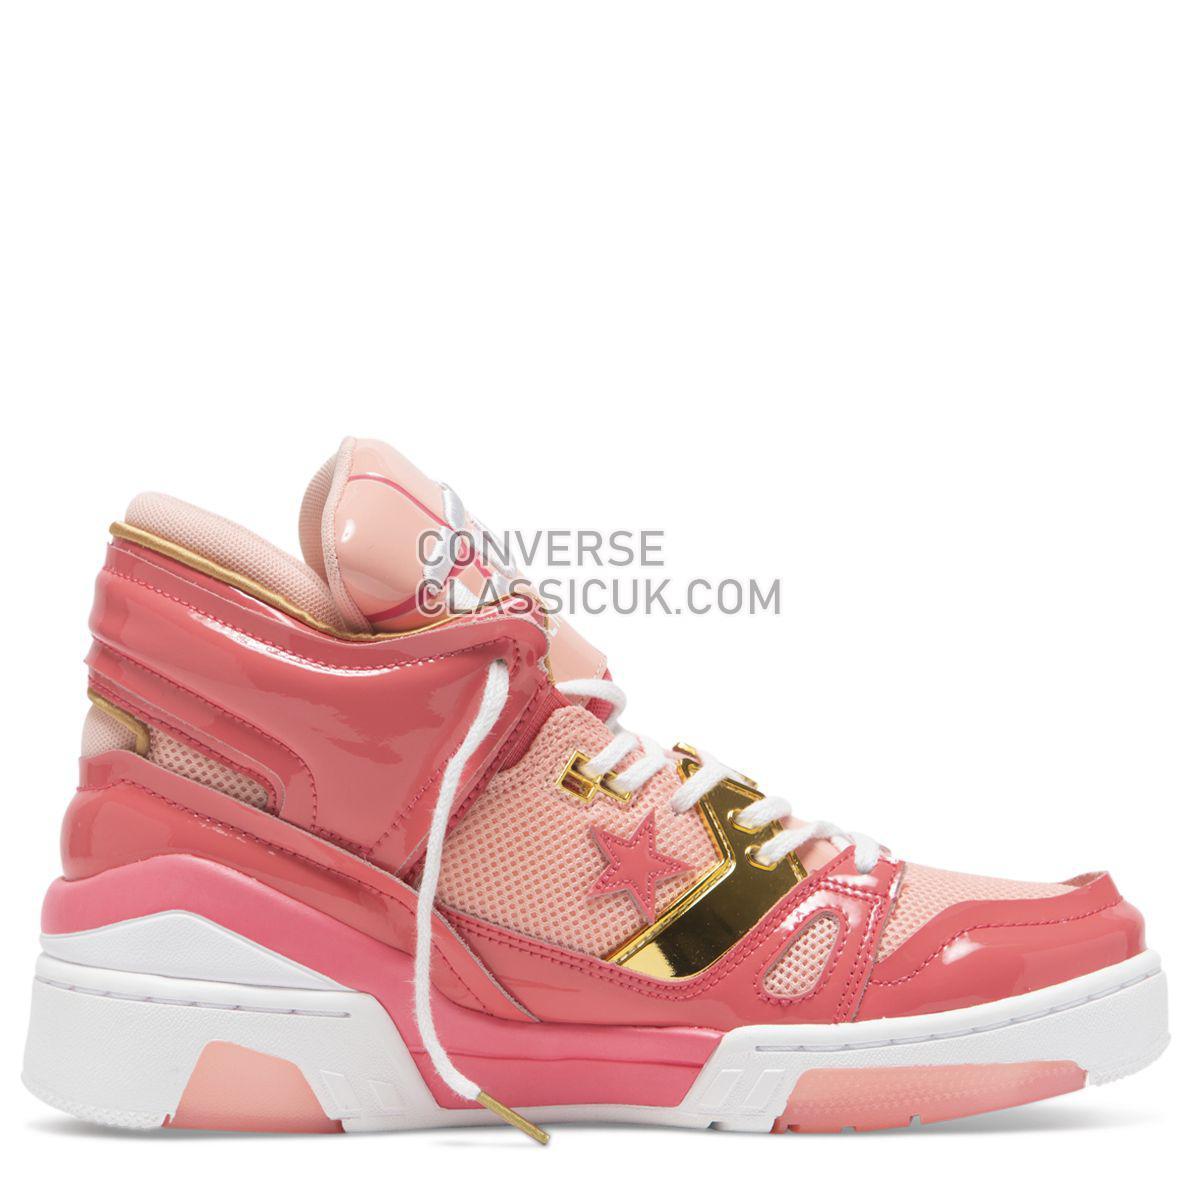 Converse X Feng Chen Wang ERX 260 Mid Calypso Coral Womens 565601 Calypso Coral/Apricot Blush Shoes